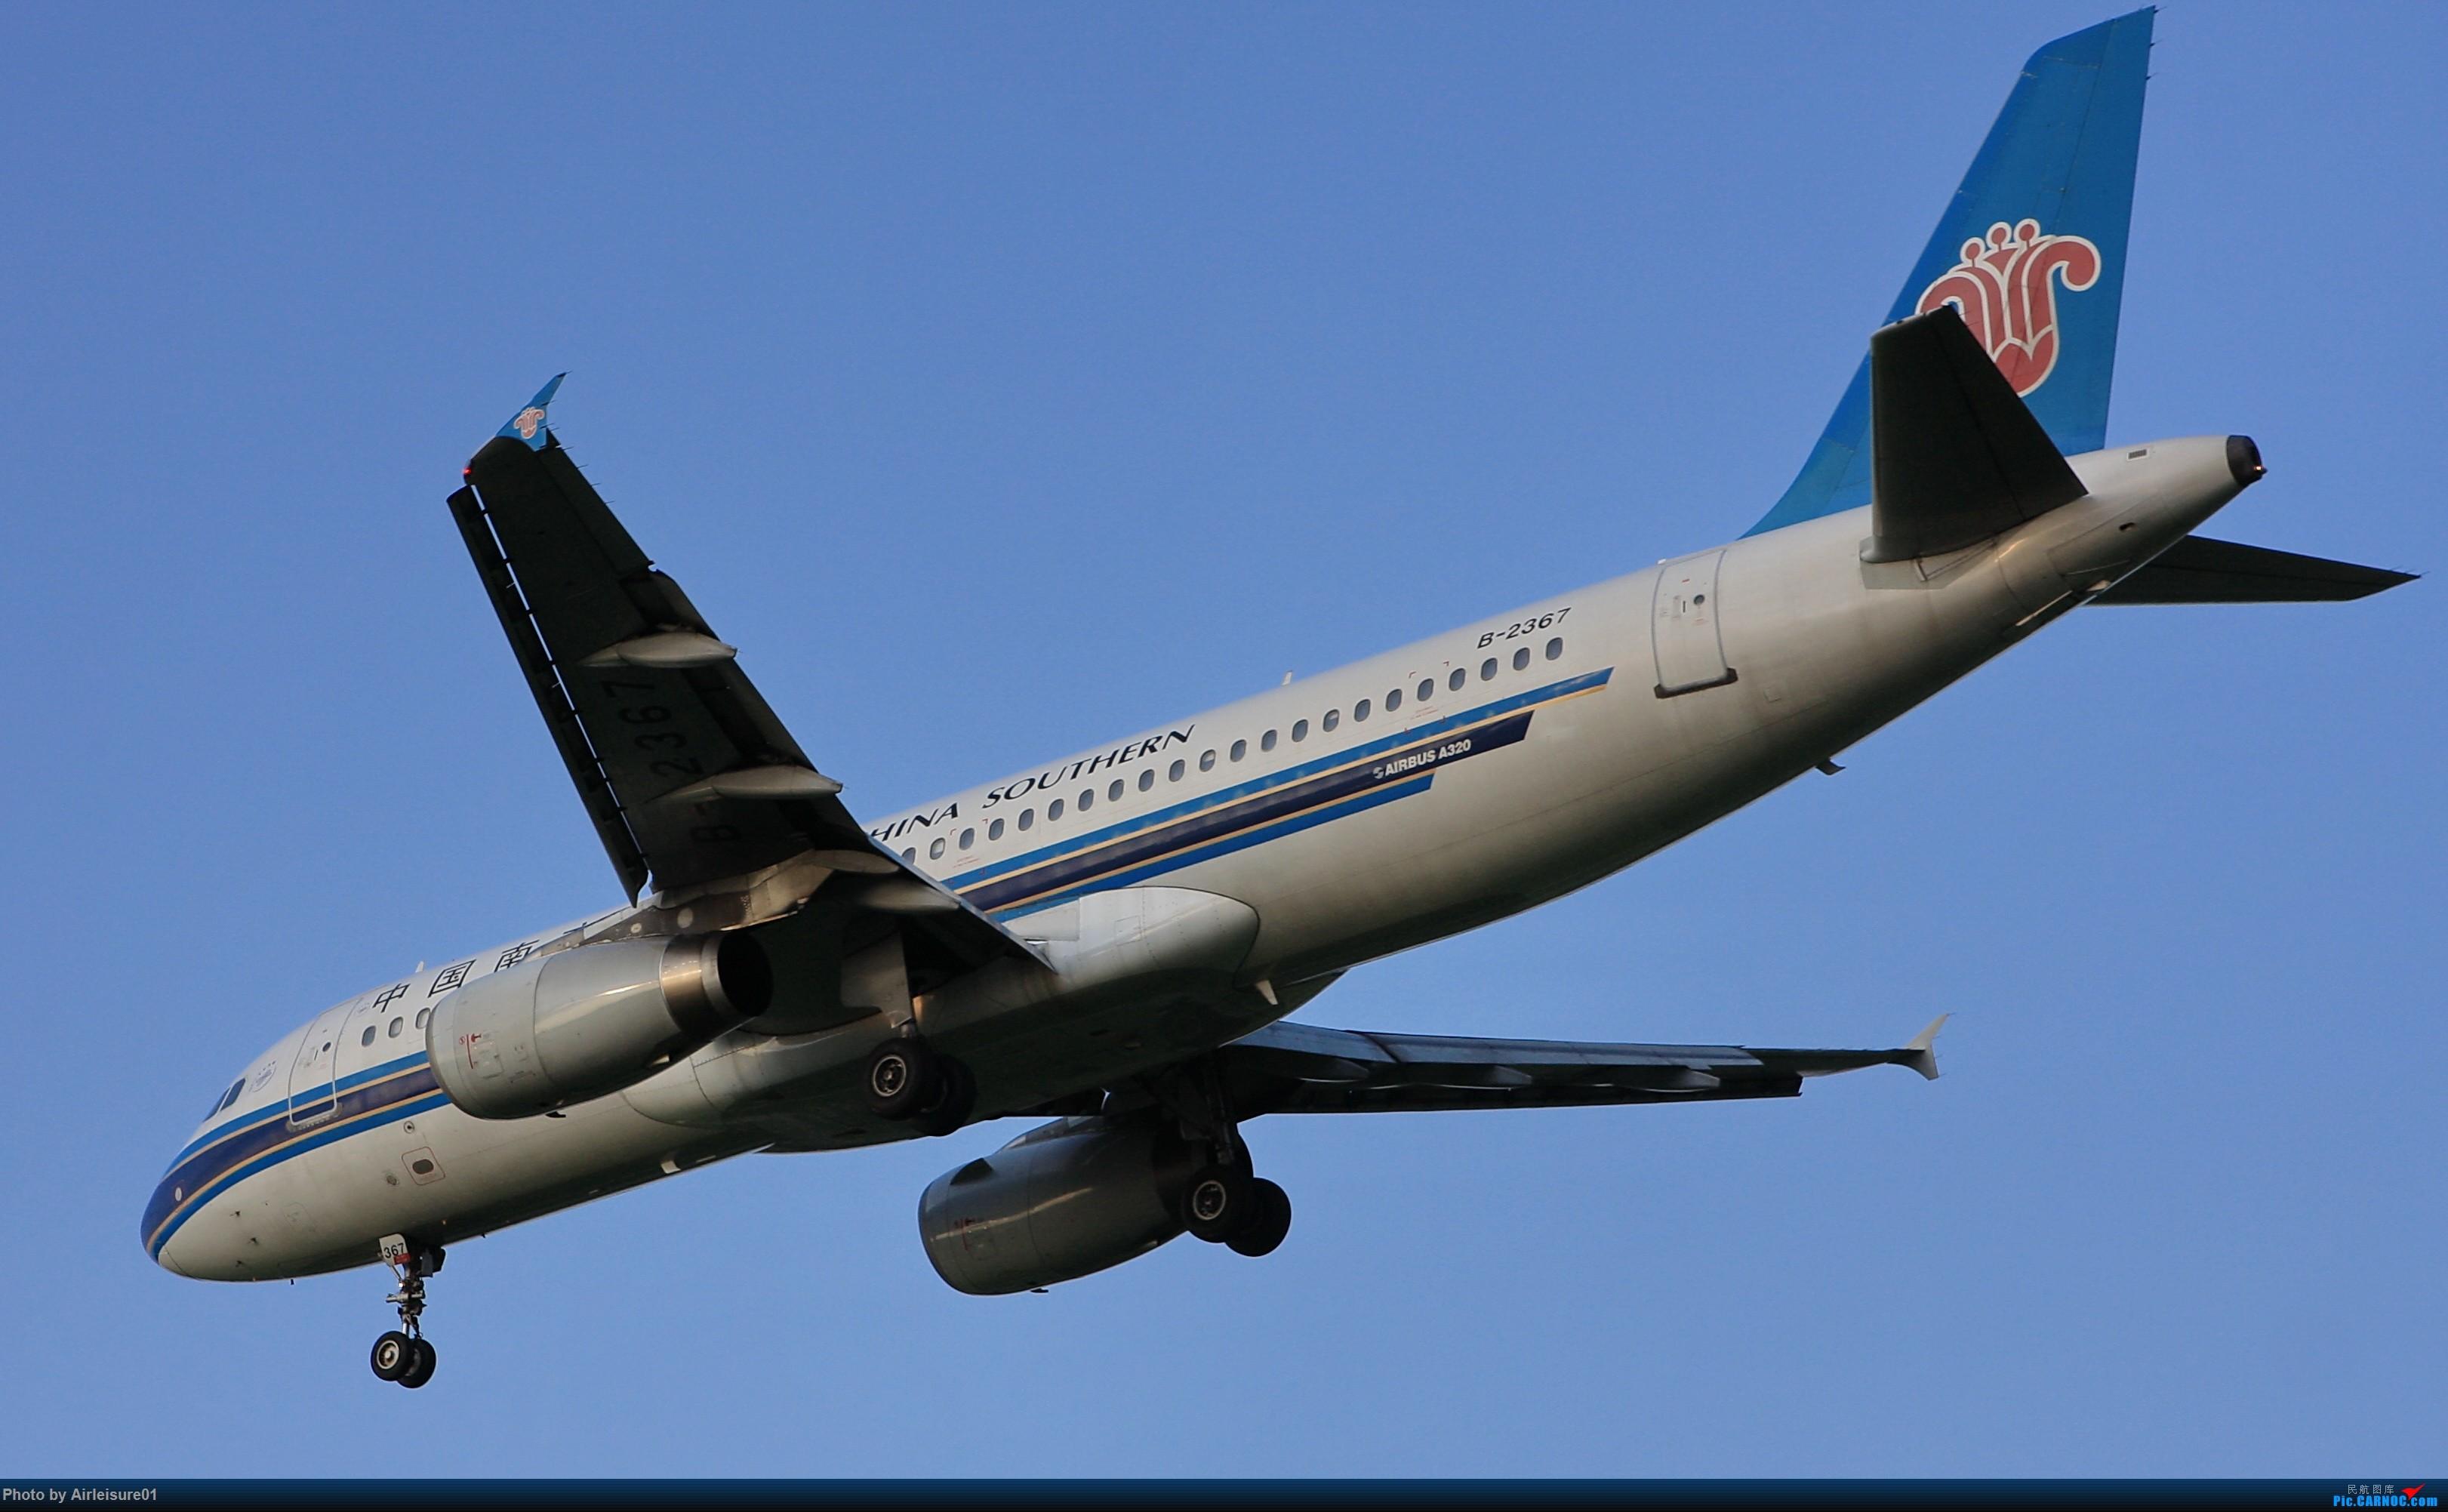 Re:[原创]新人首发。。请大神们多多指导 AIRBUS A320-200 B-2367 中国北京首都国际机场